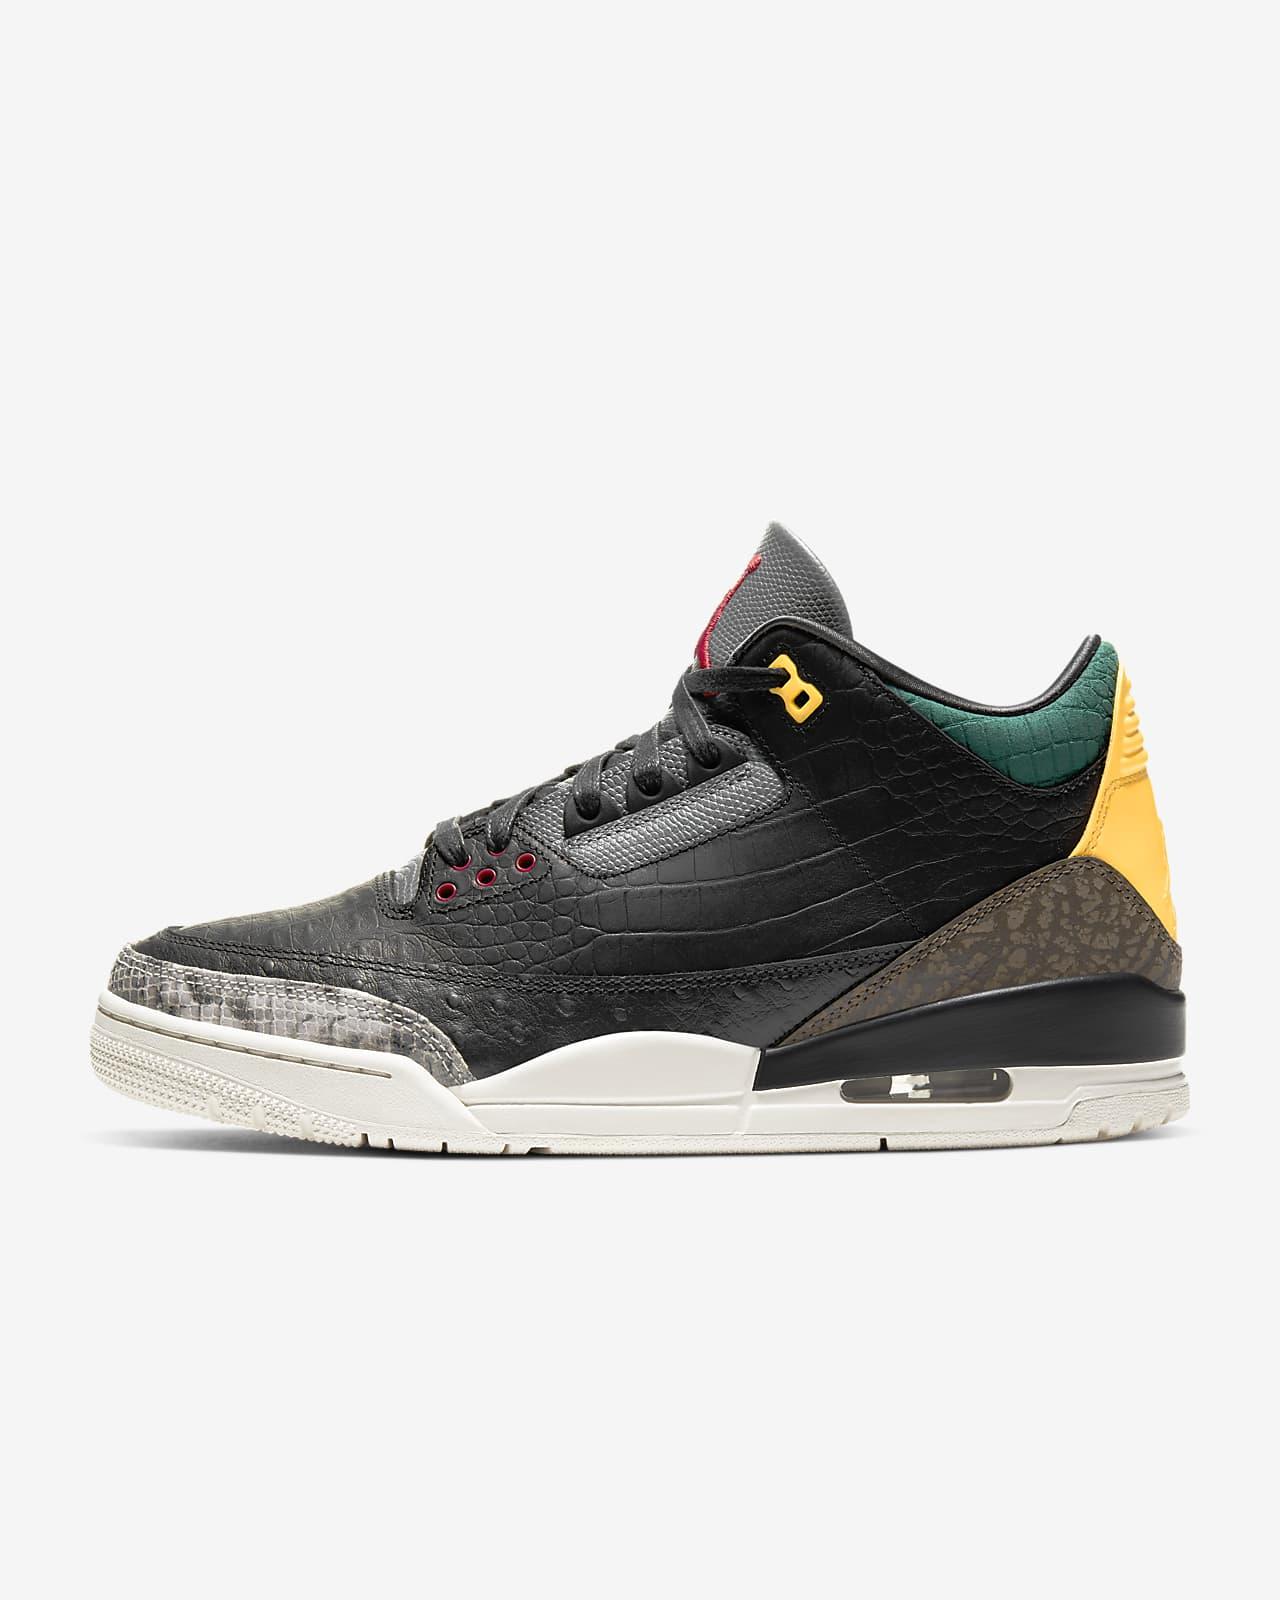 Air Jordan 3 Retro SE Shoes